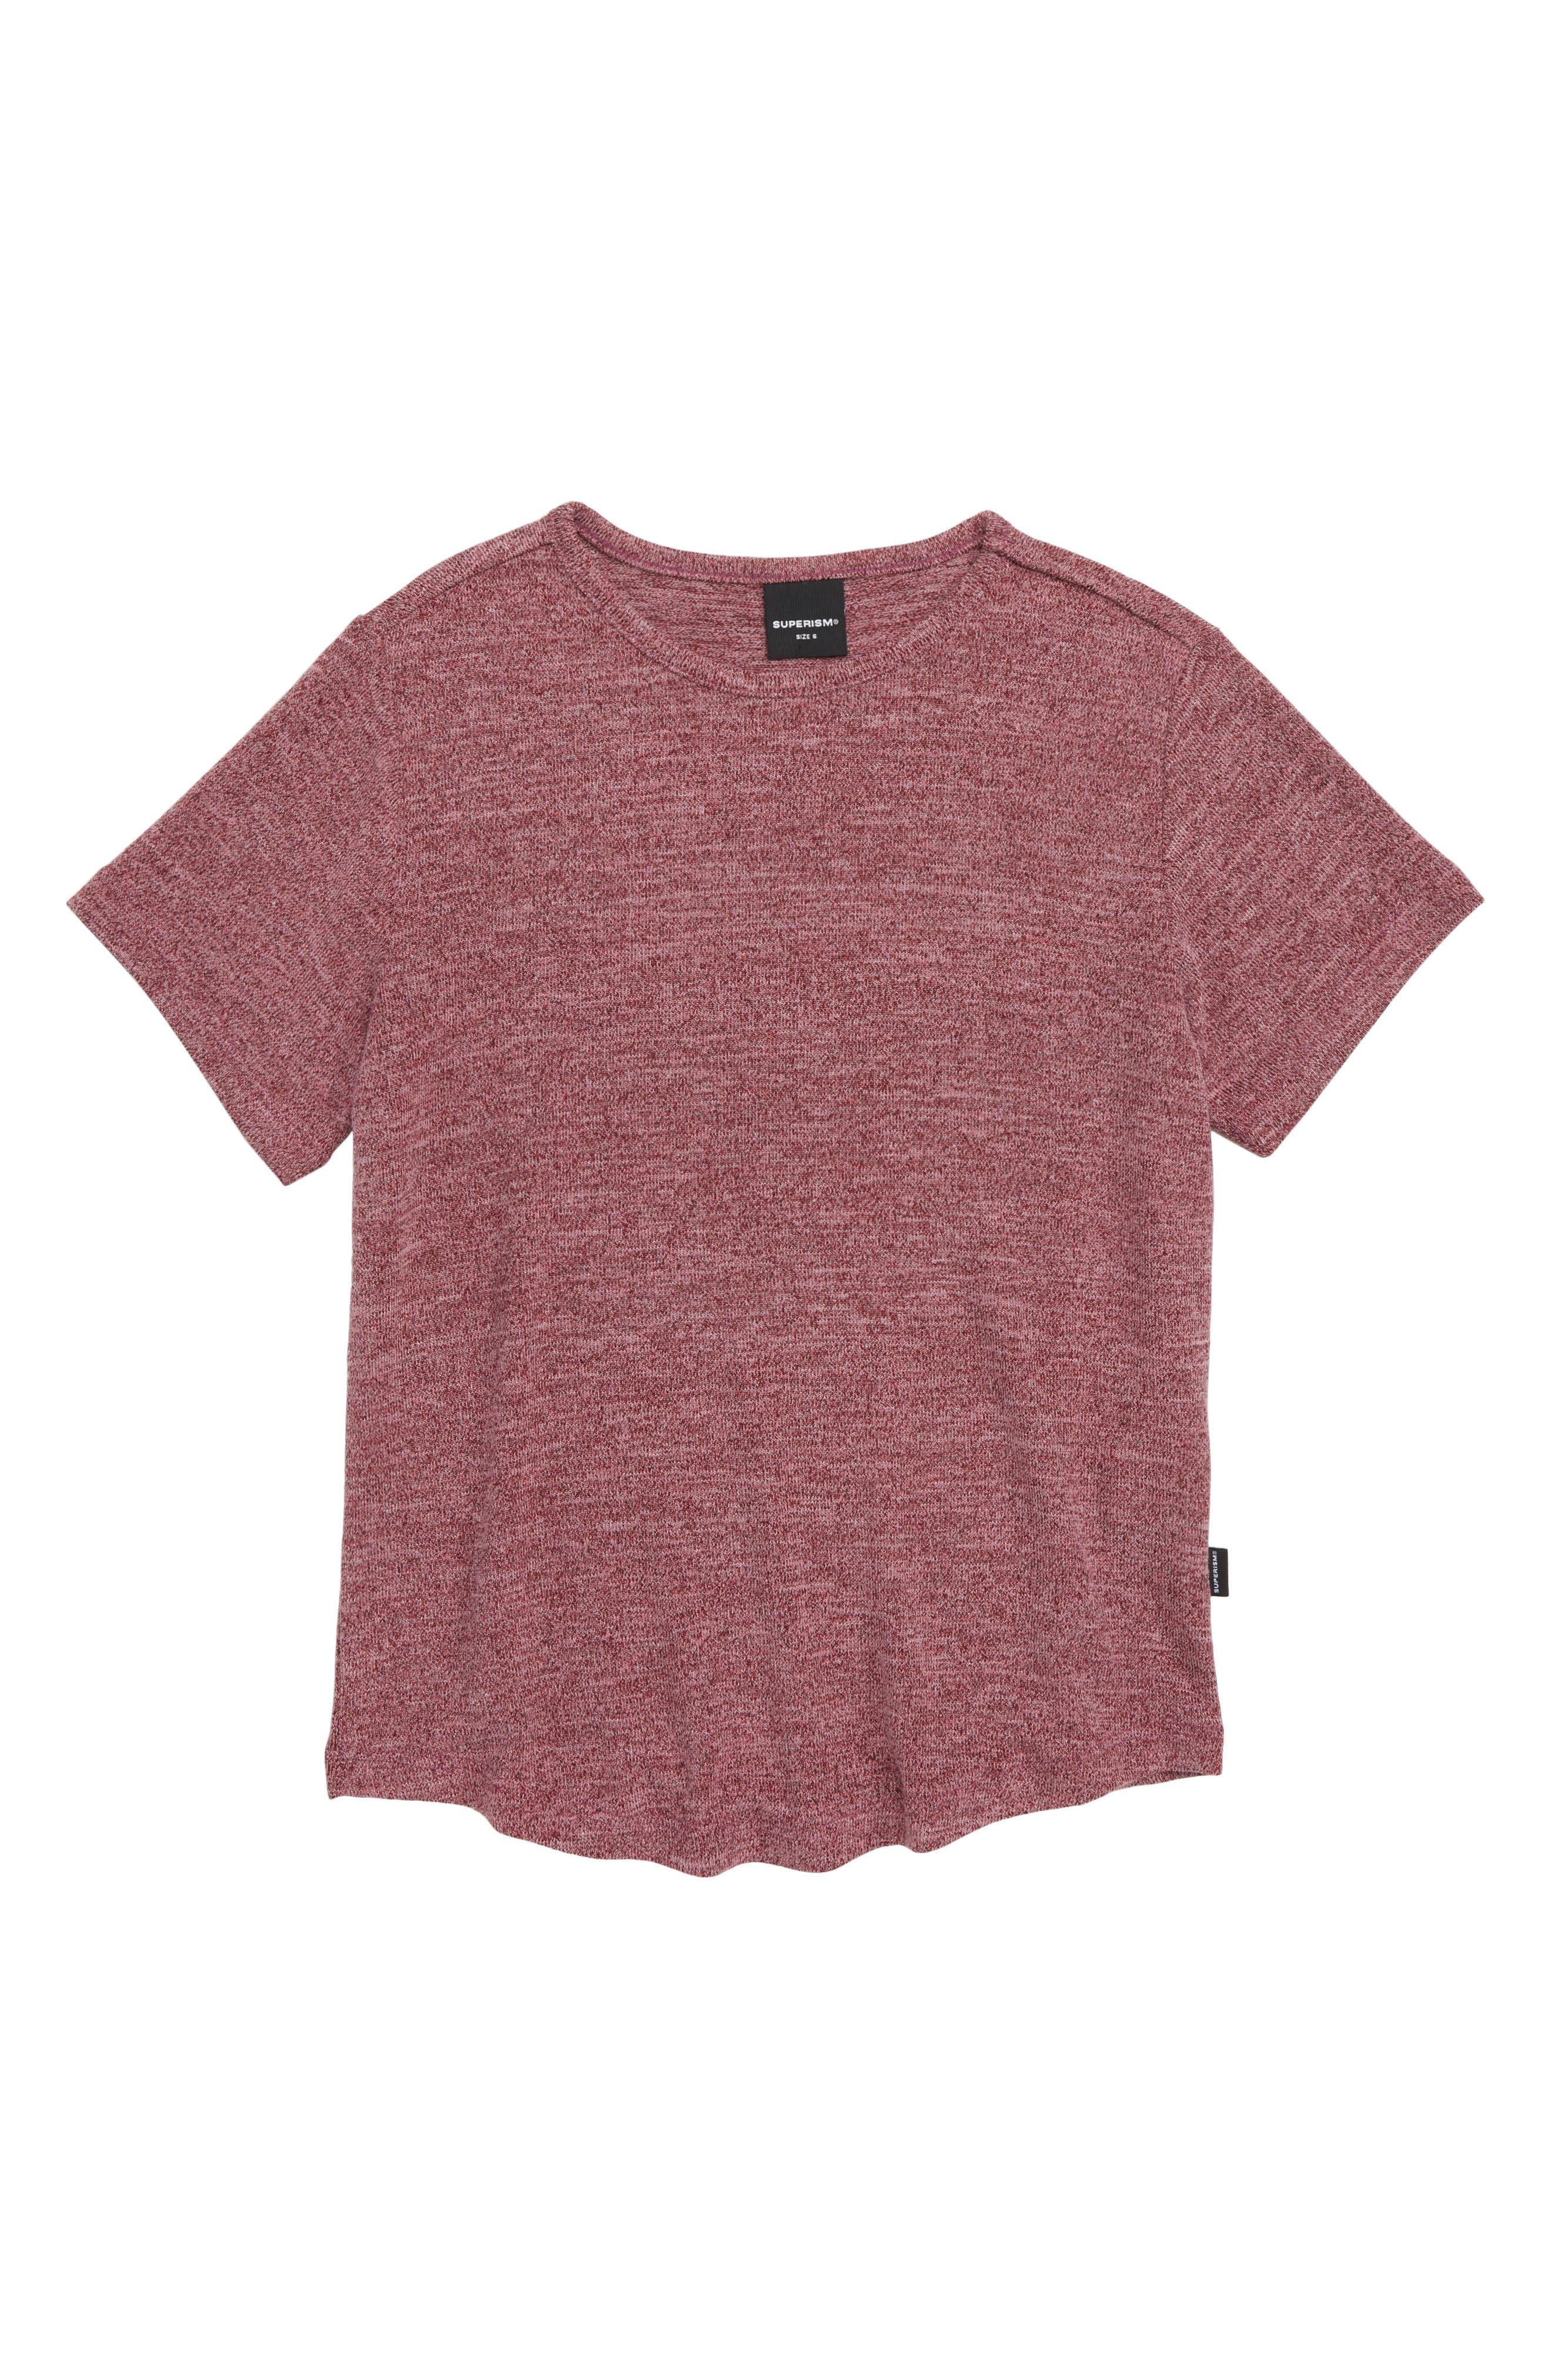 Landon Stretch T-Shirt,                             Main thumbnail 1, color,                             BURGUNDY